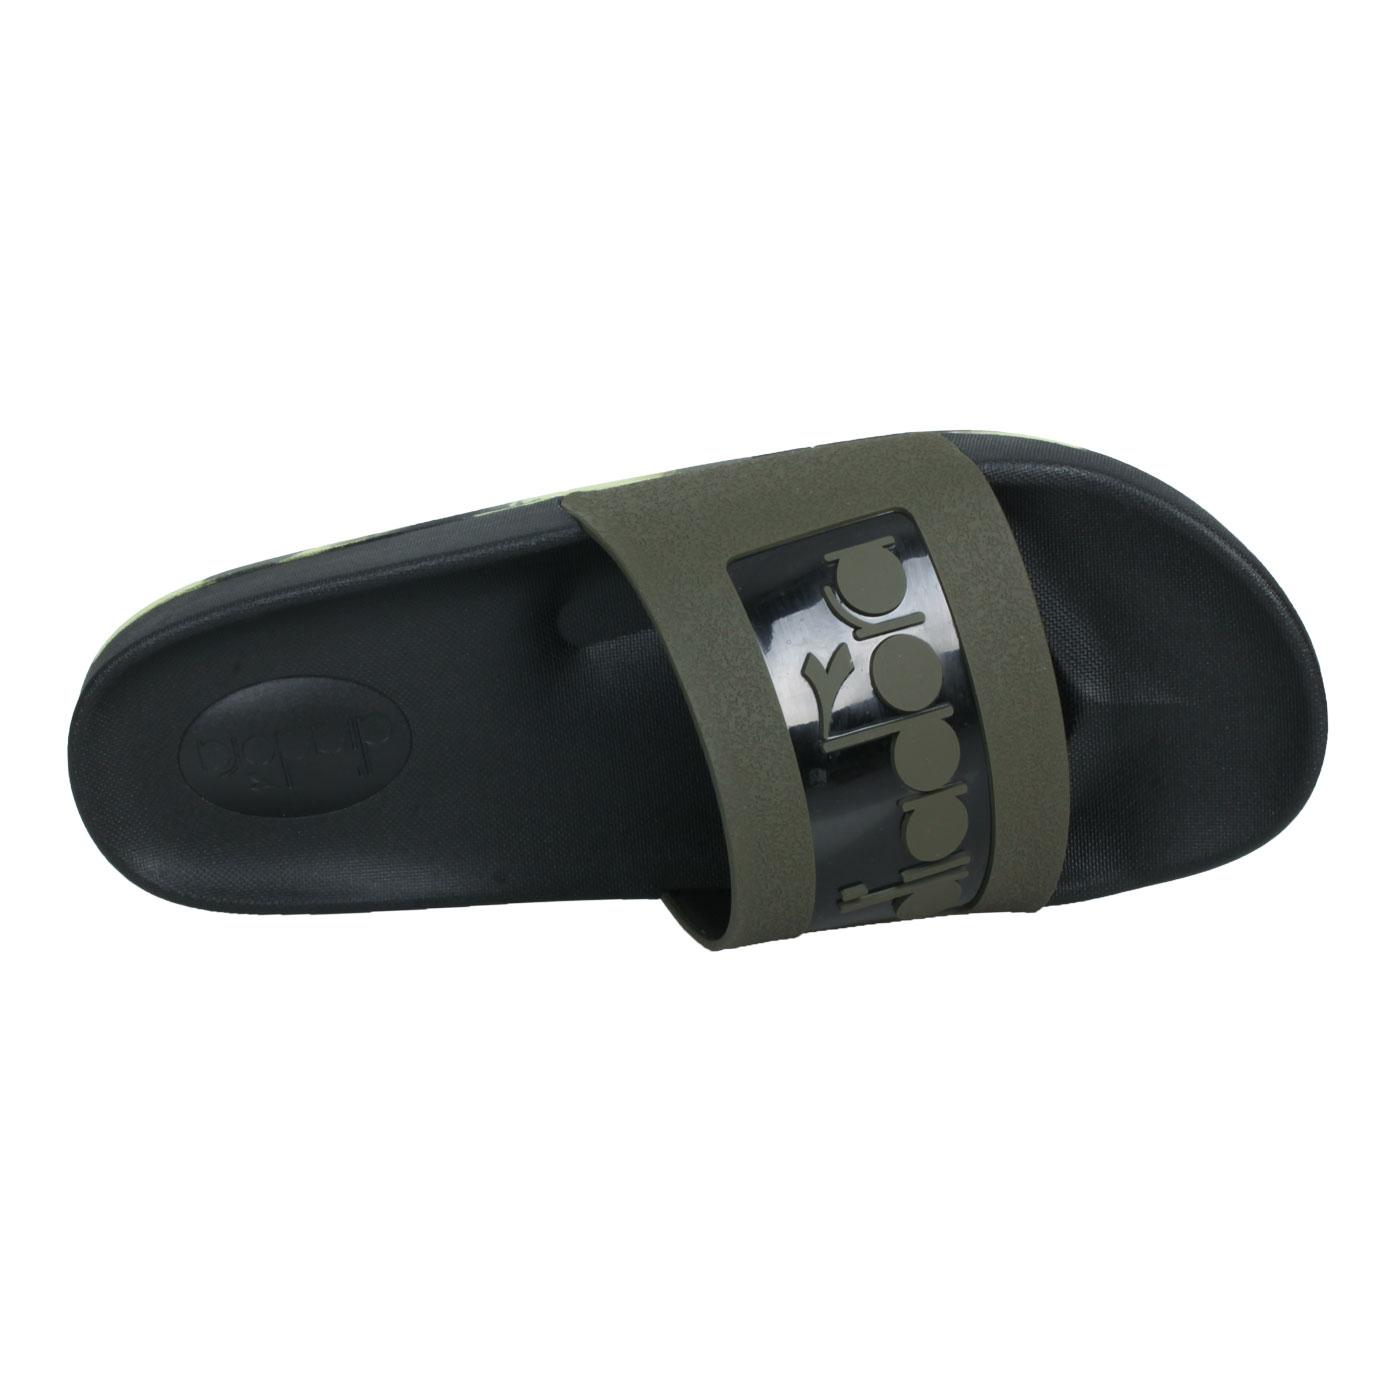 DIADORA 男款運動拖鞋 DA71168 - 黑軍綠